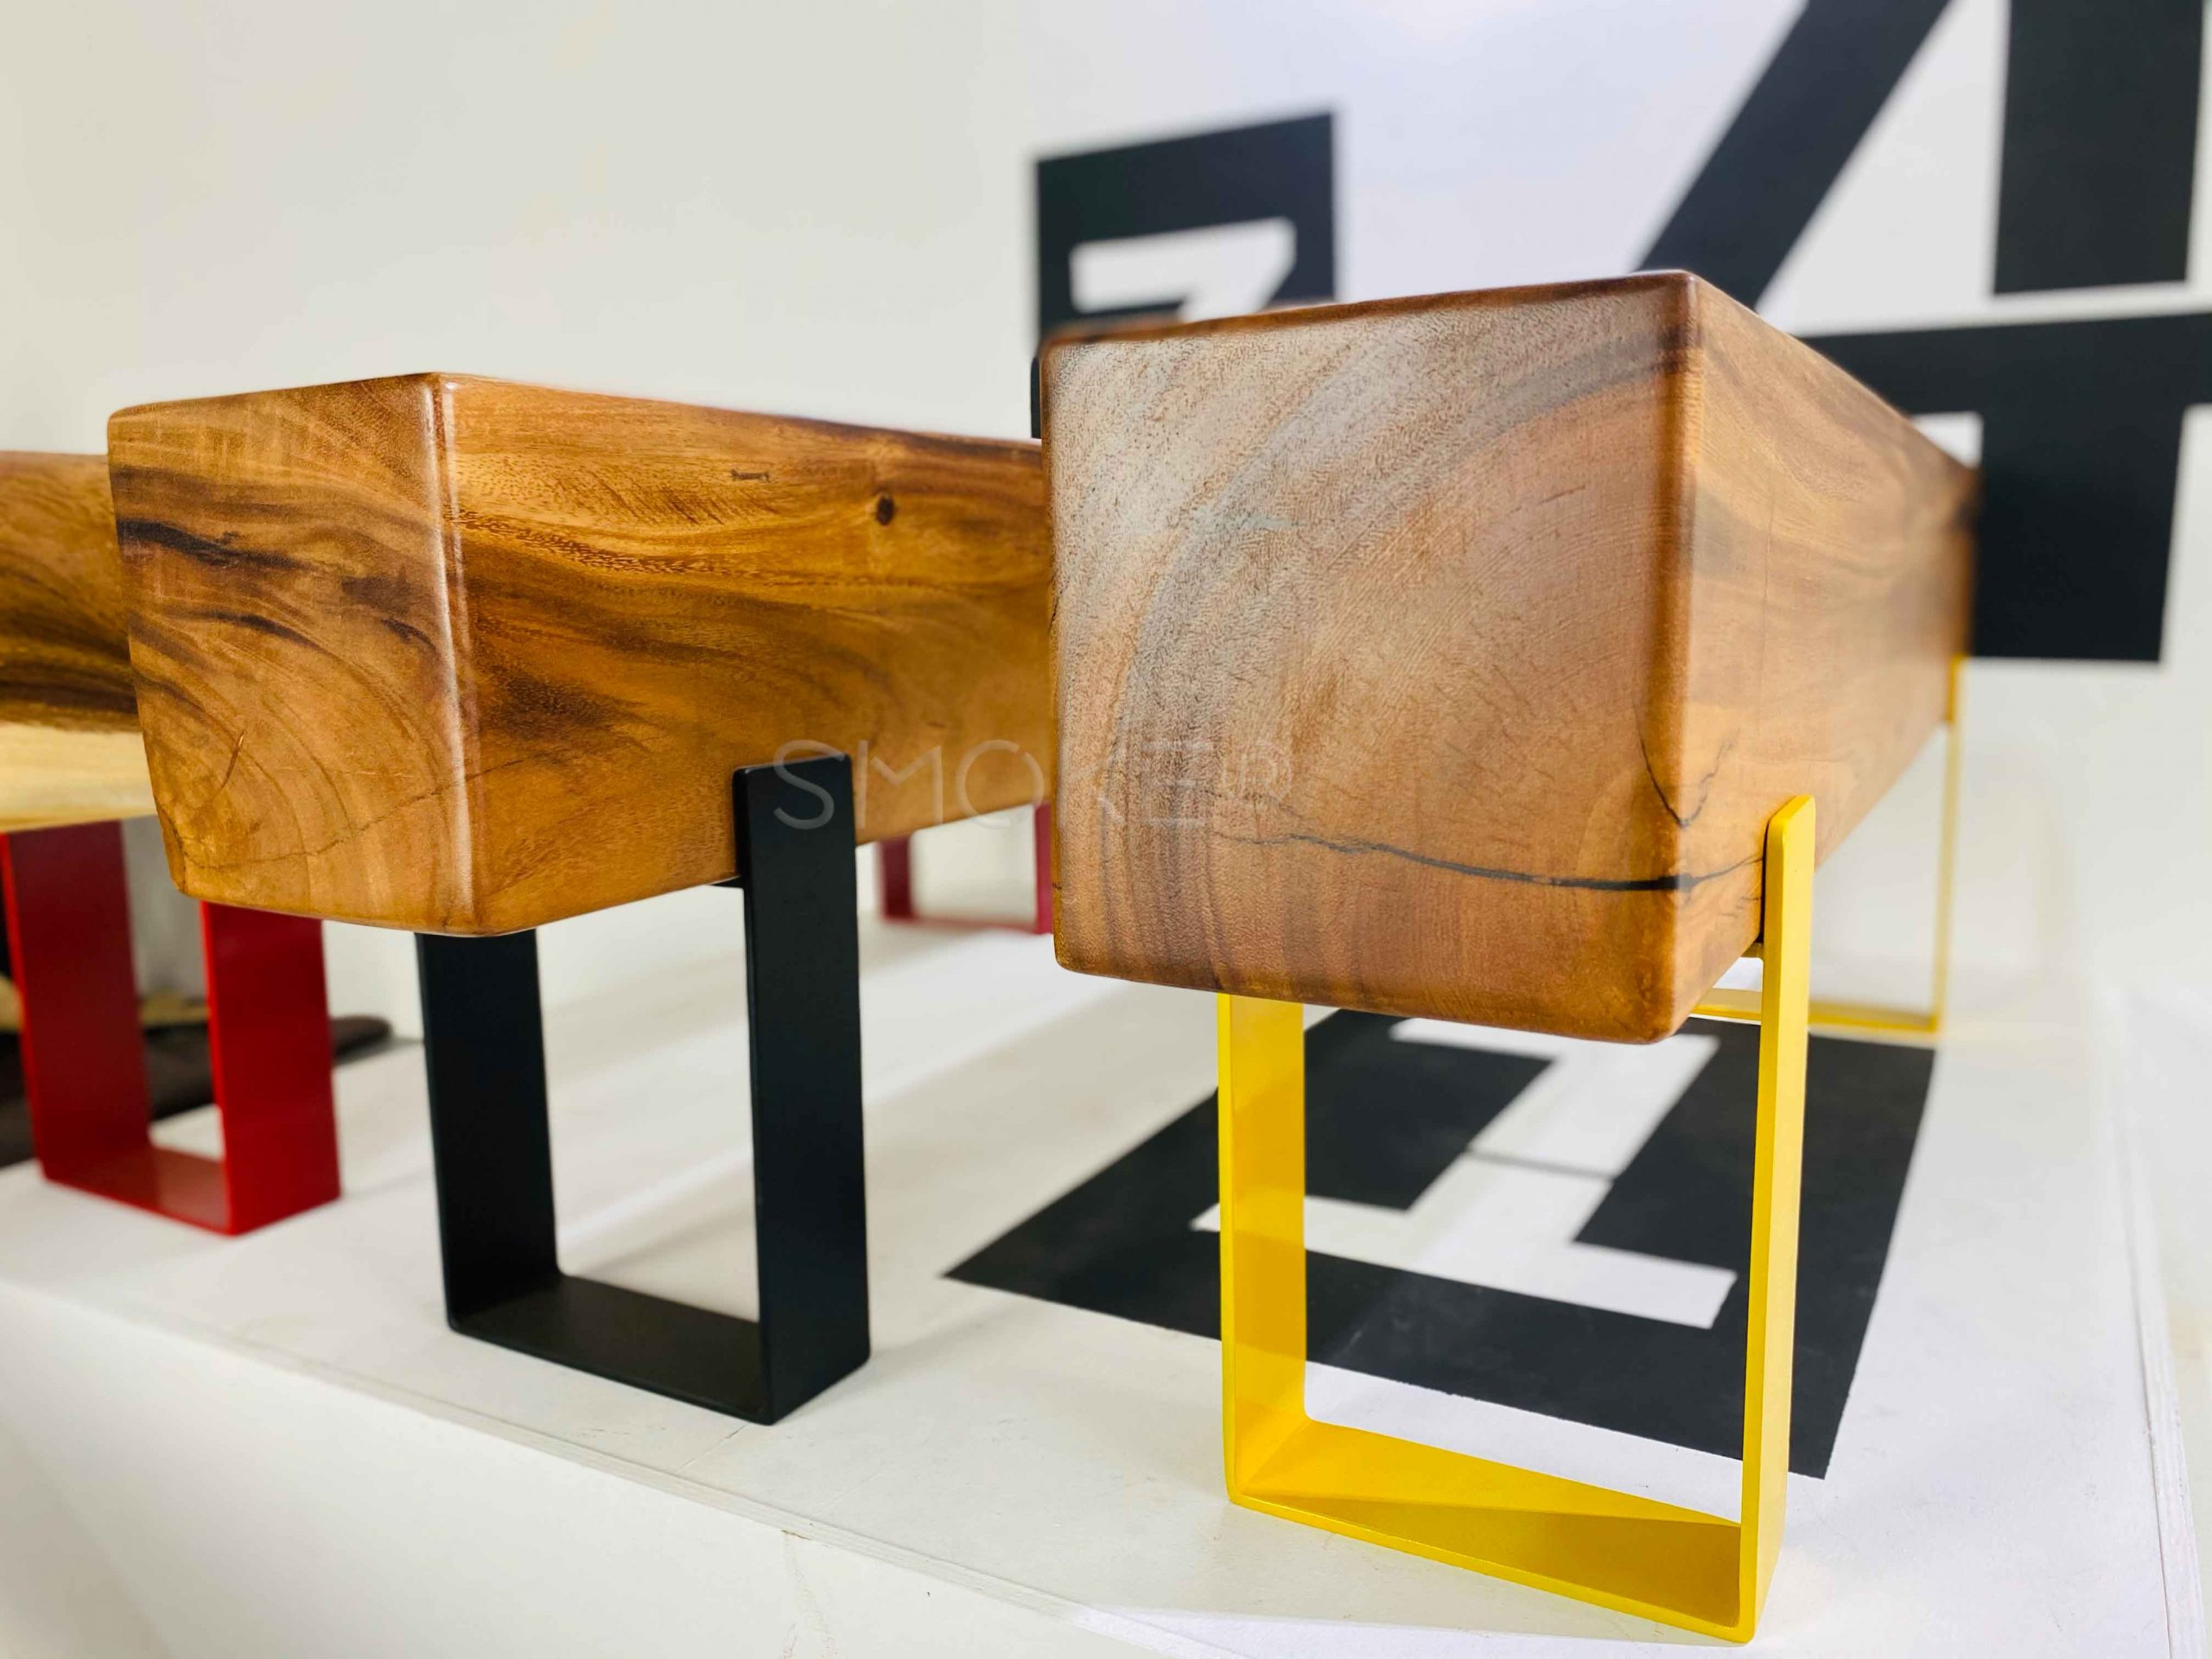 Logan Wooden Bench Perspective Display 1